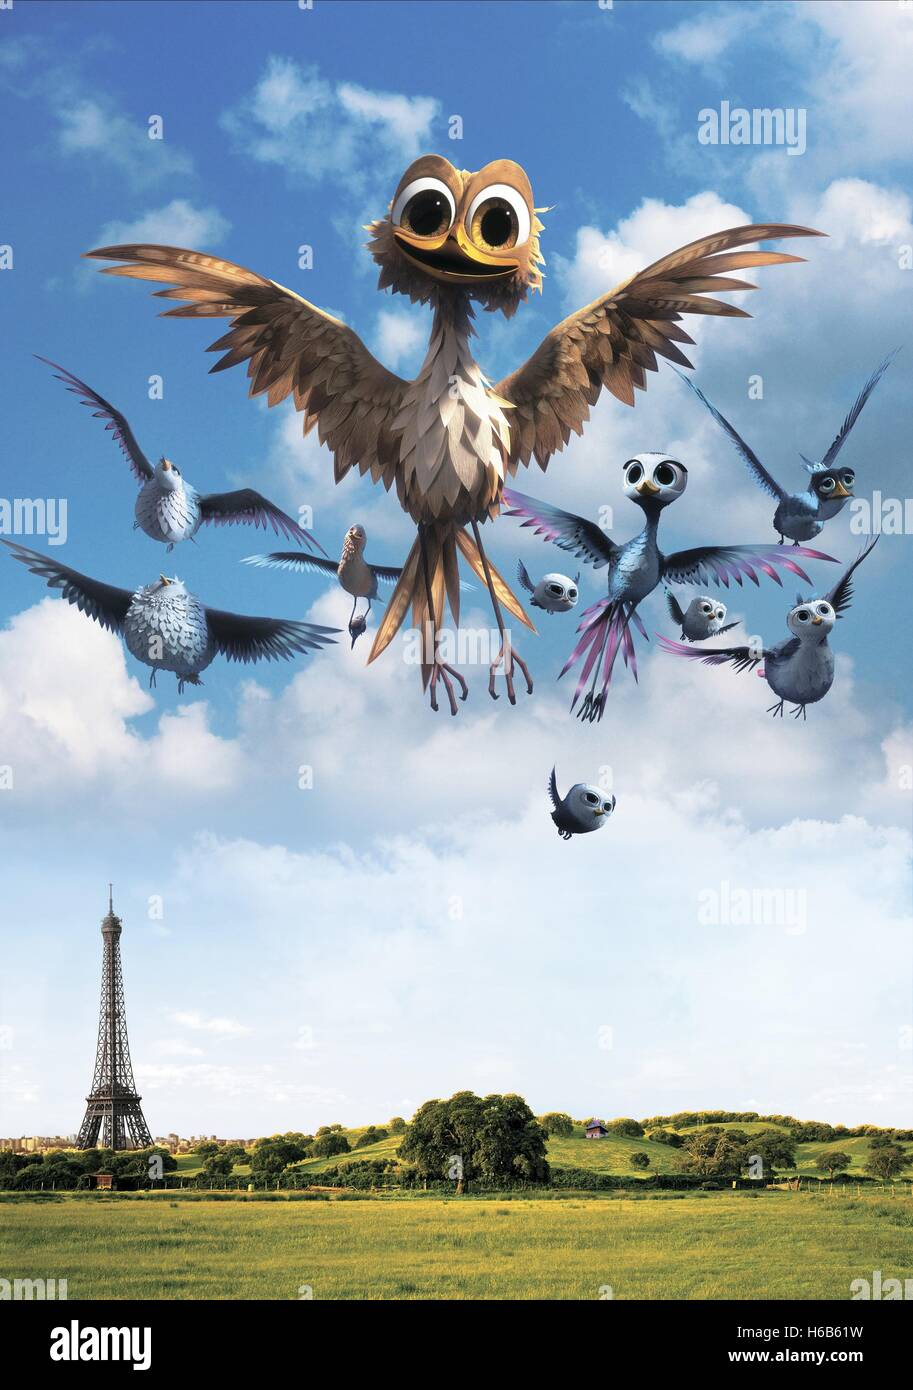 DARIUS YELLOWBIRD & DELF YELLOWBIRD (2014) - Stock Image